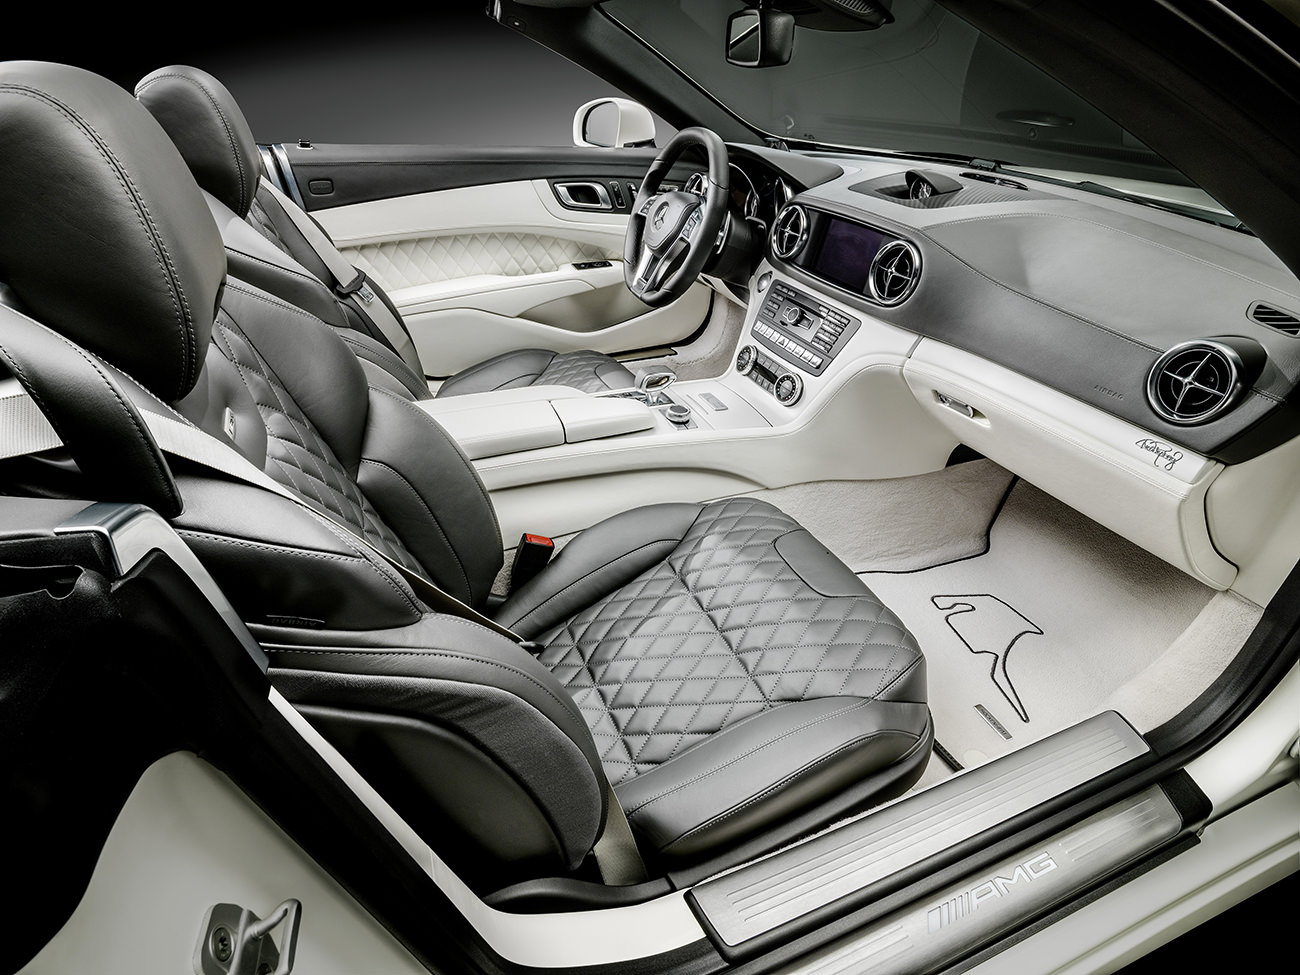 Mercedes-Benz-World-Championship-2014-Collector-Edition-4